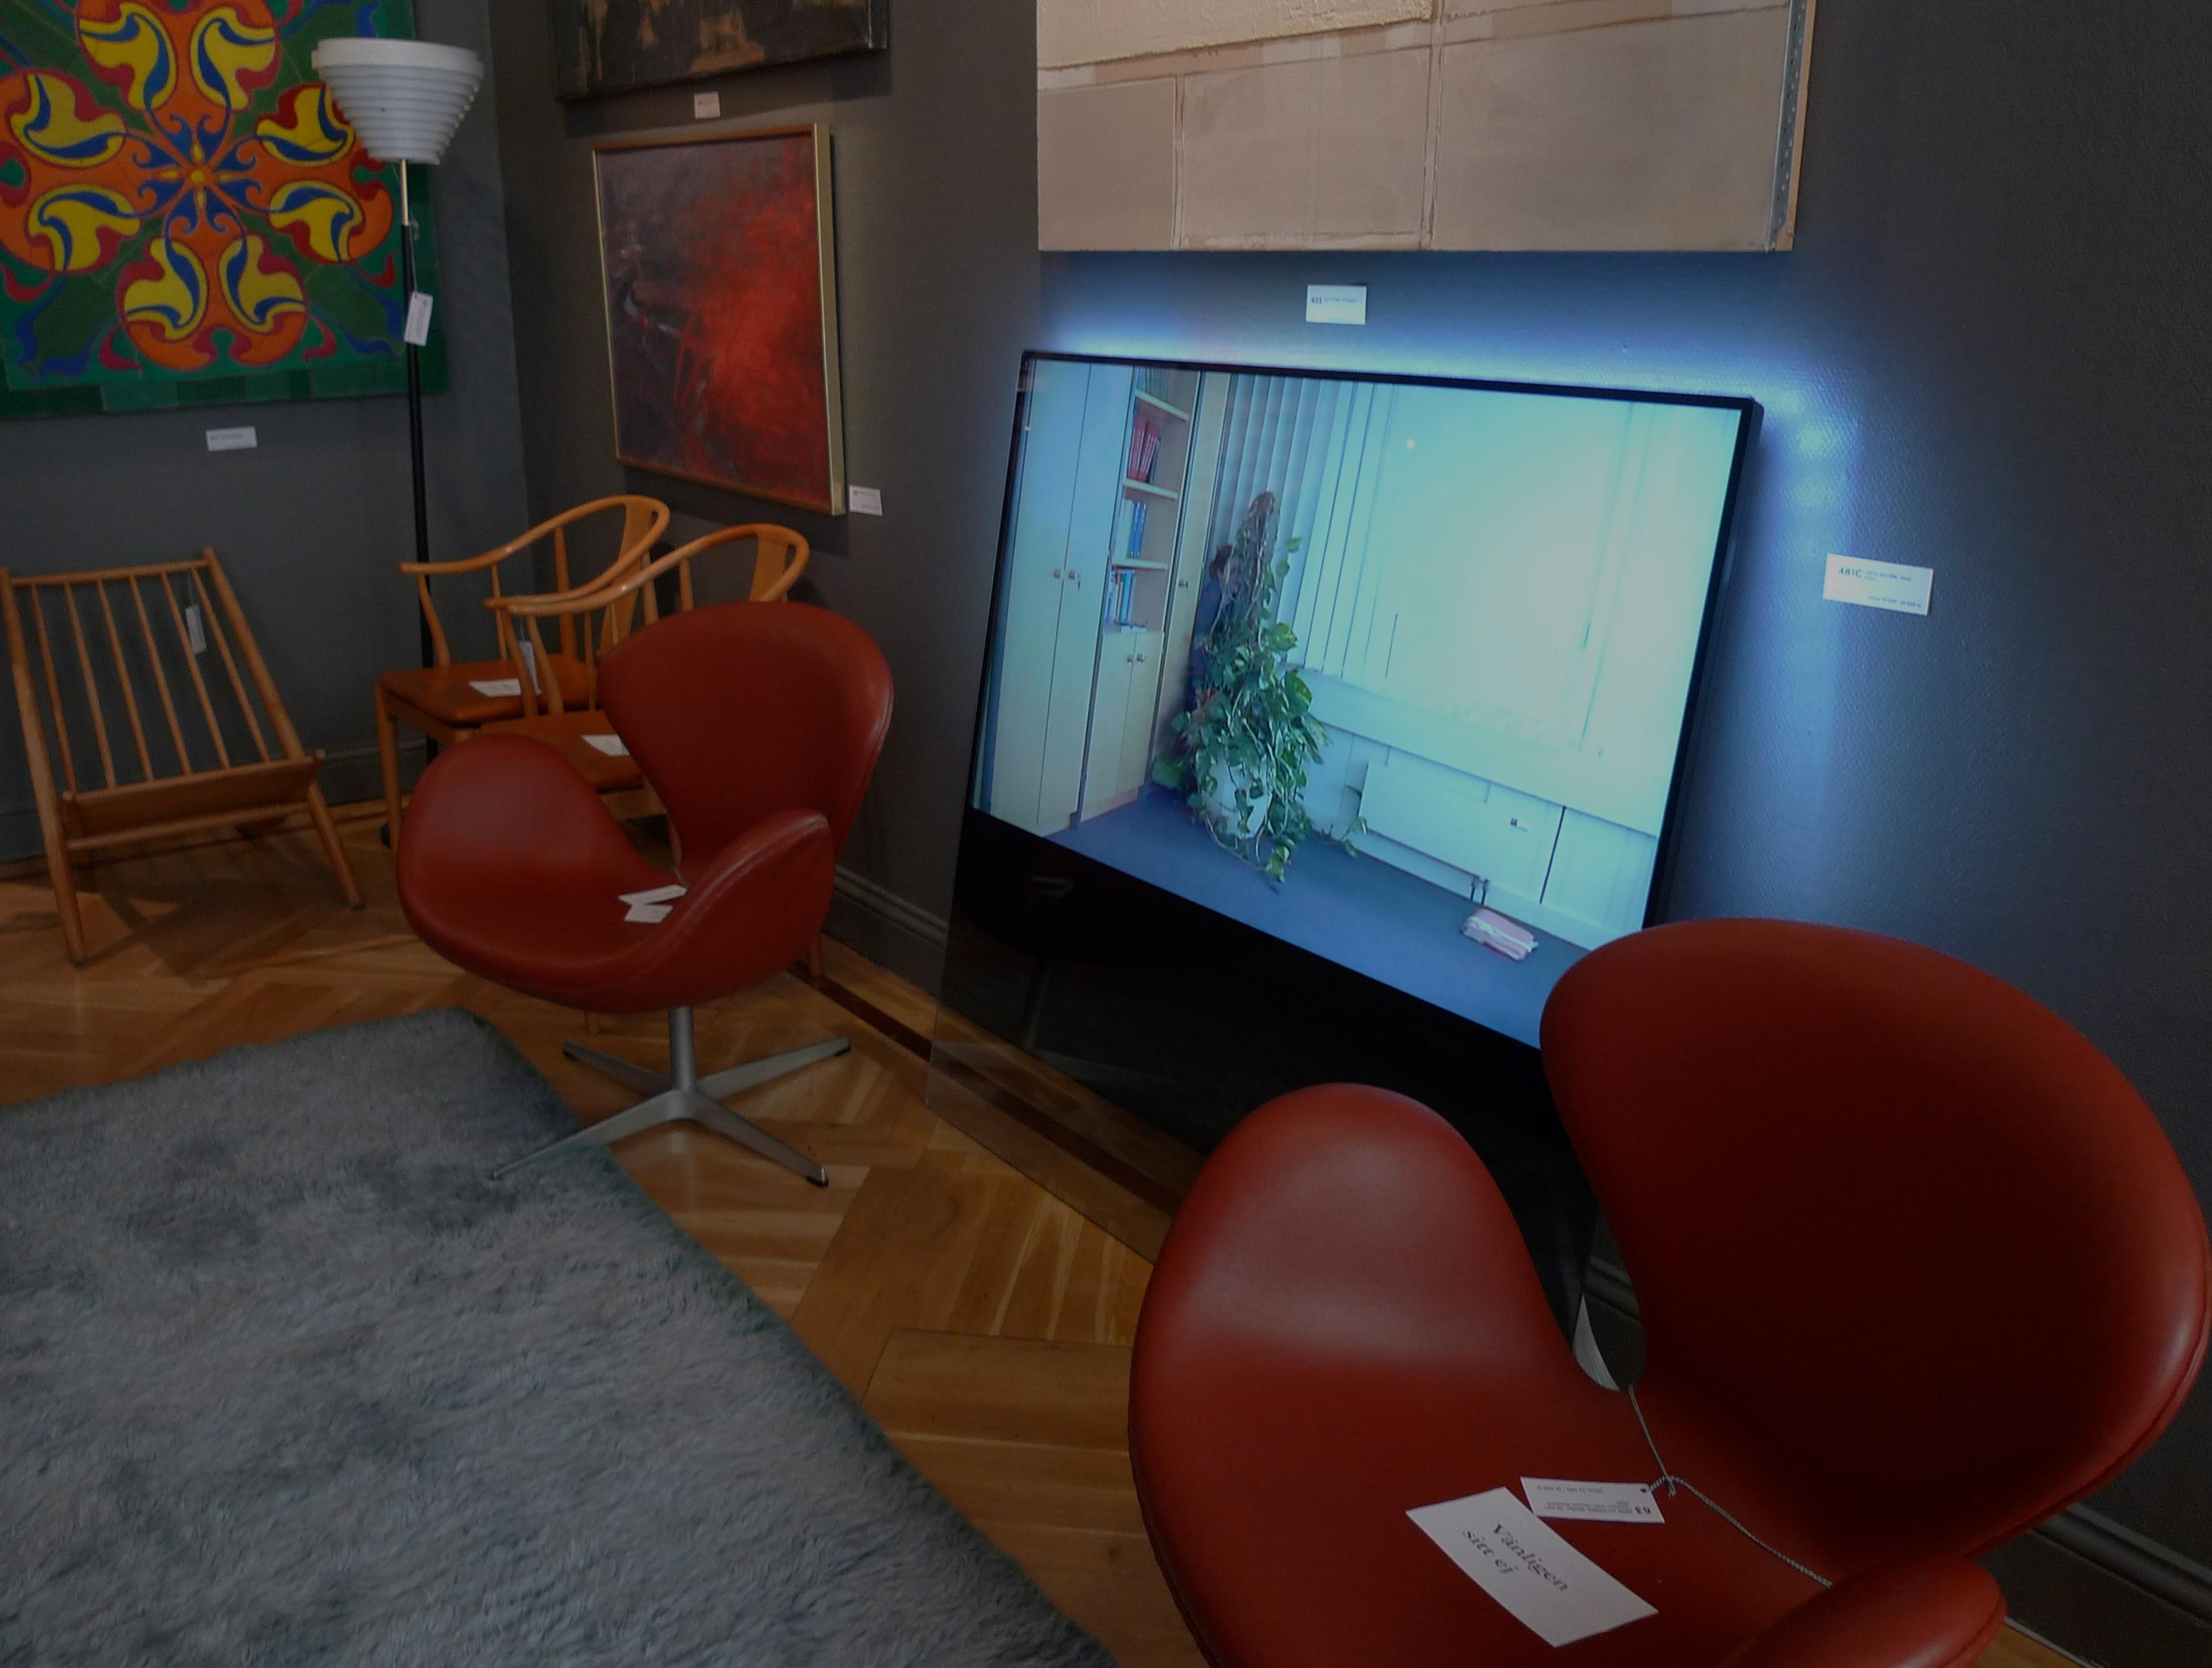 philips designline bukowskis philips tv by tp vision. Black Bedroom Furniture Sets. Home Design Ideas